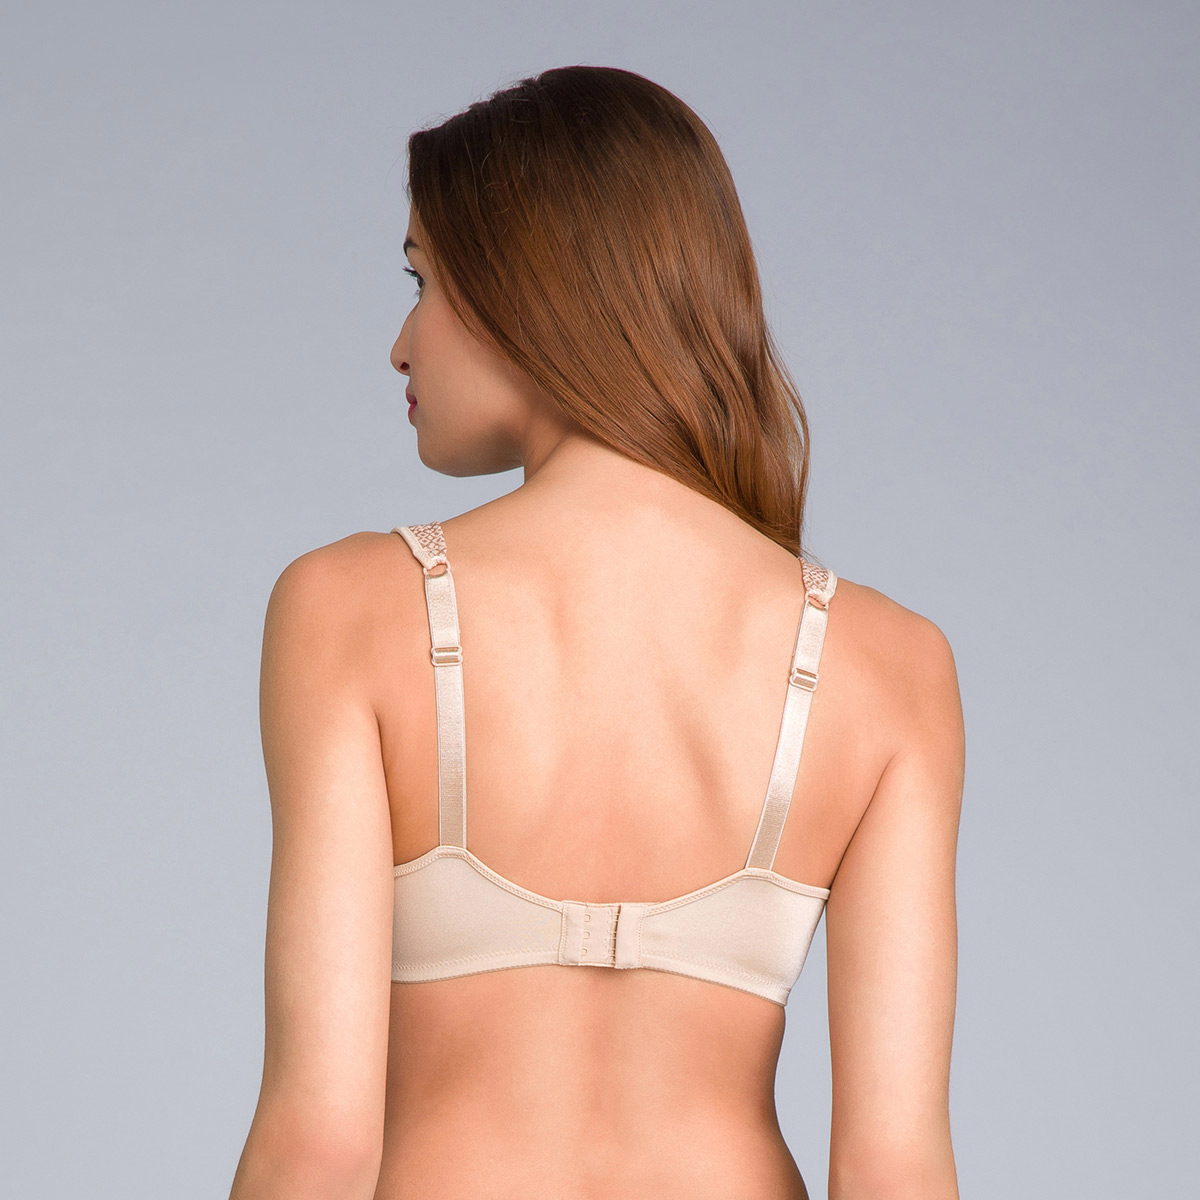 Underwired bra in beige -  Body Revelation, , PLAYTEX